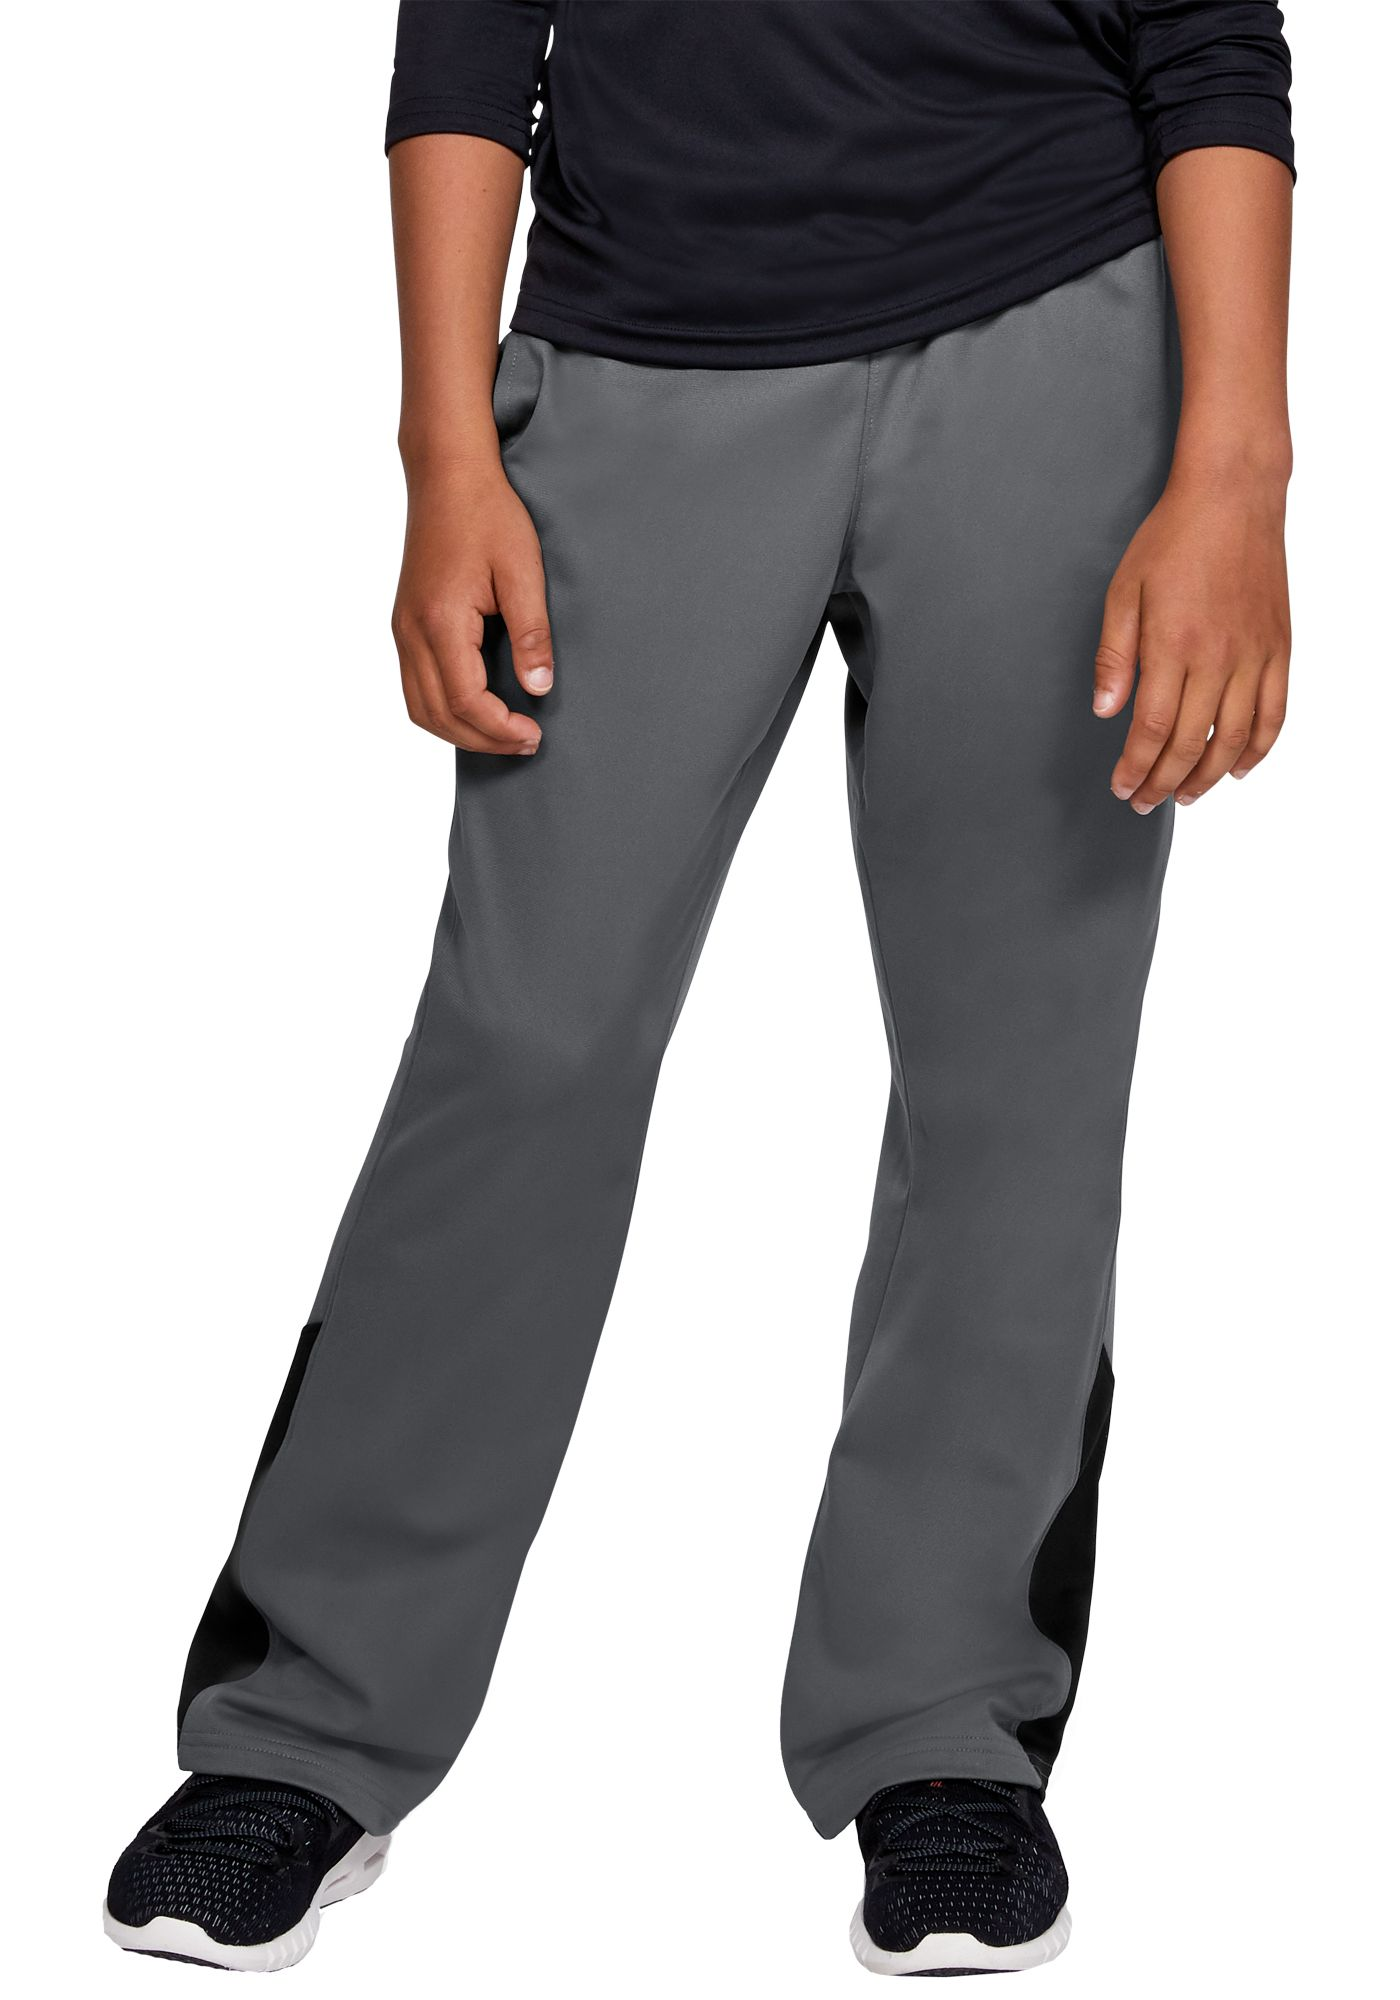 Under Armour Boys' Brawler Pants 2.0